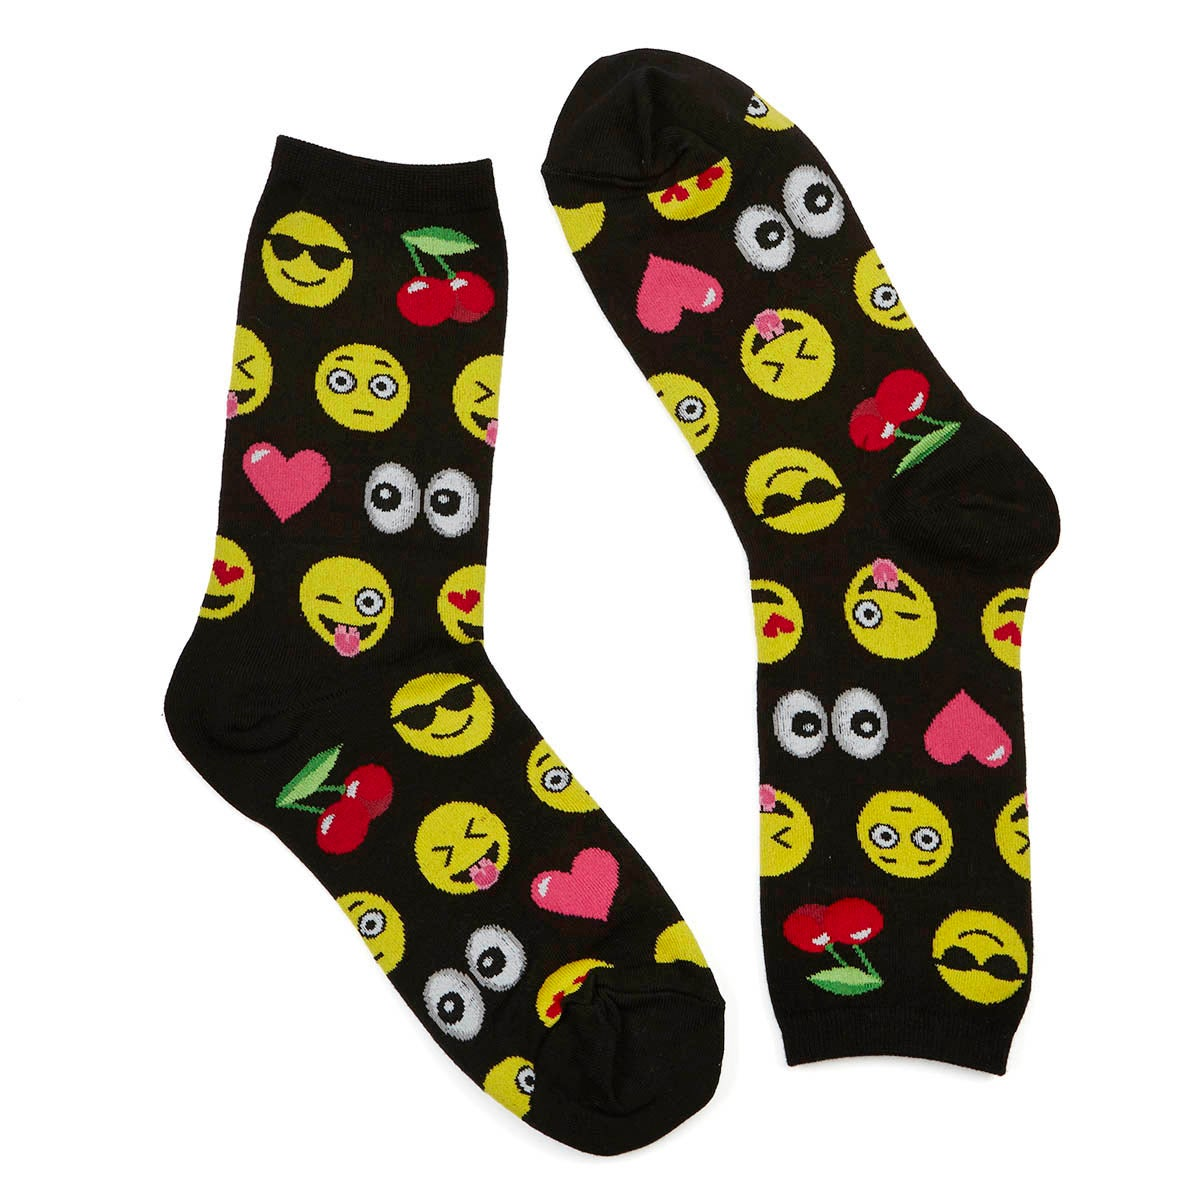 Lds Emoji black/multi printed sock